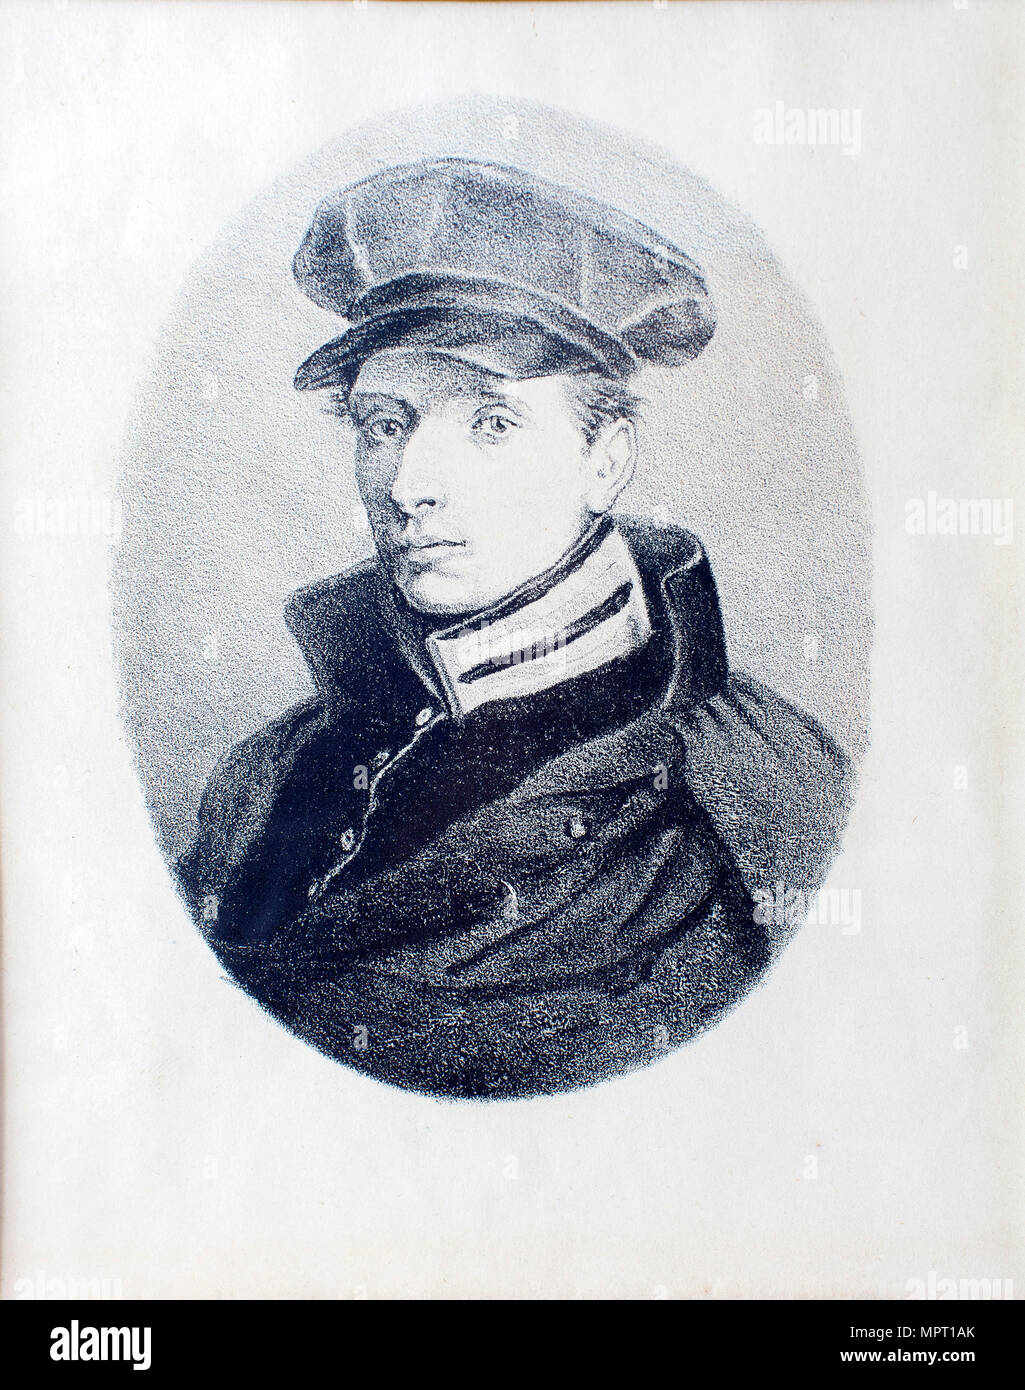 Who is Vladimir Ivanovich Dahl